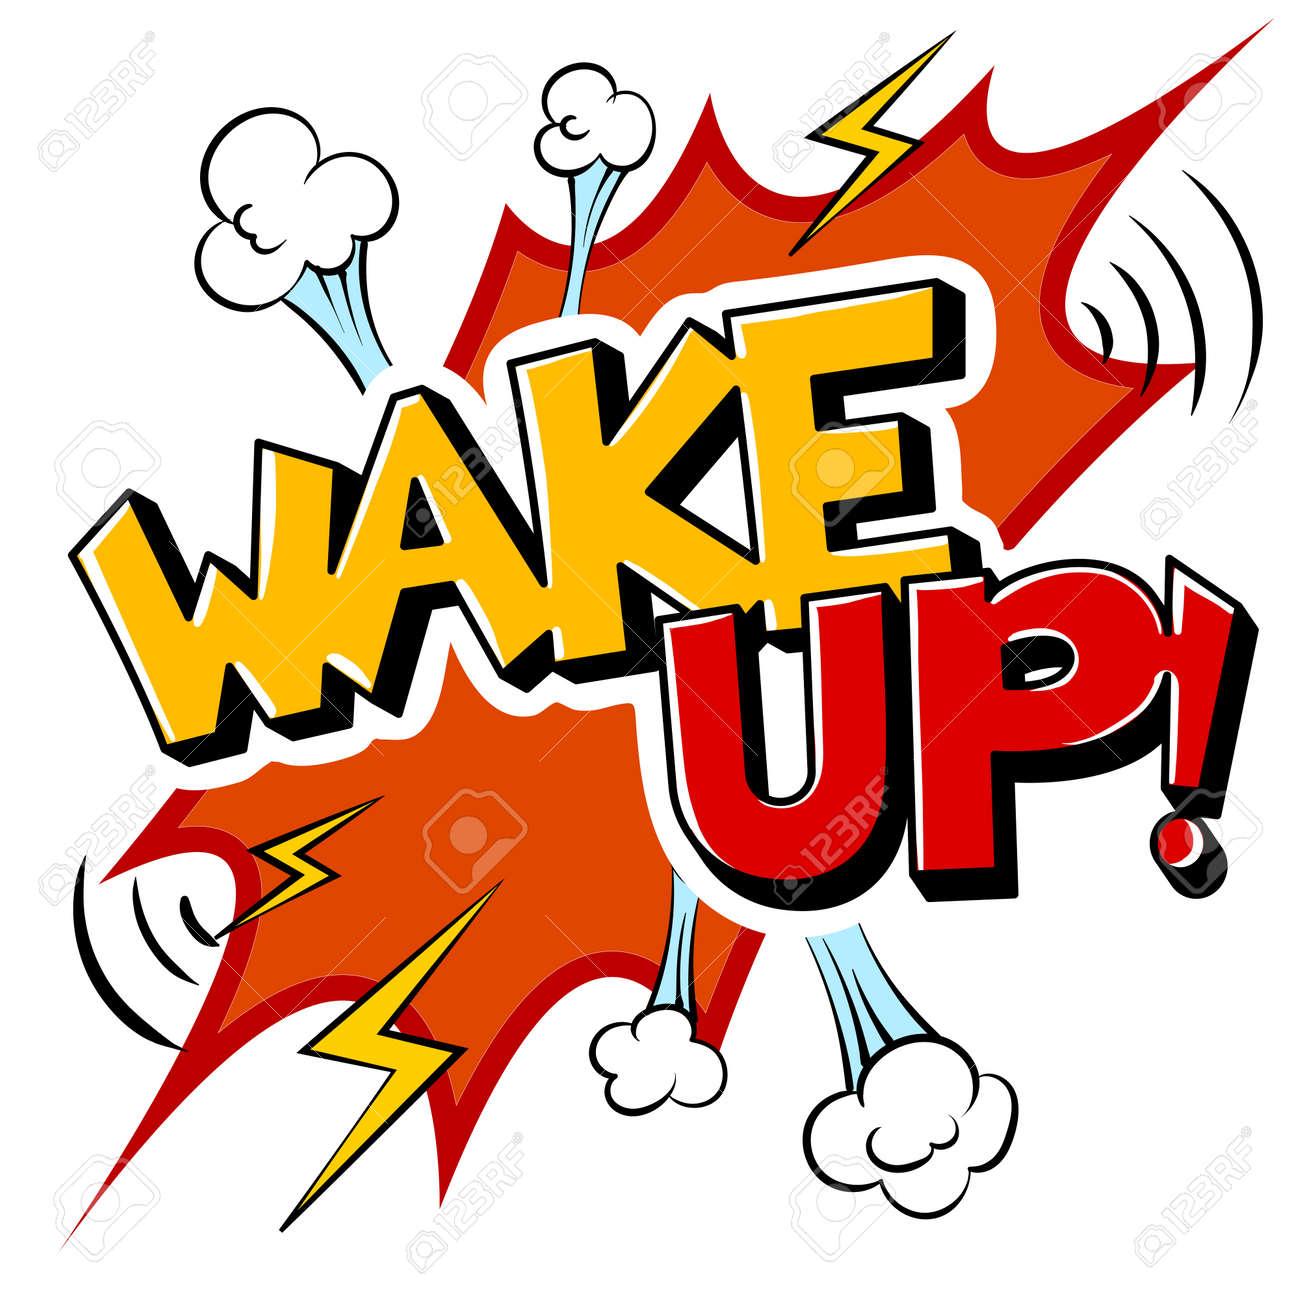 Wake Up Clip Art